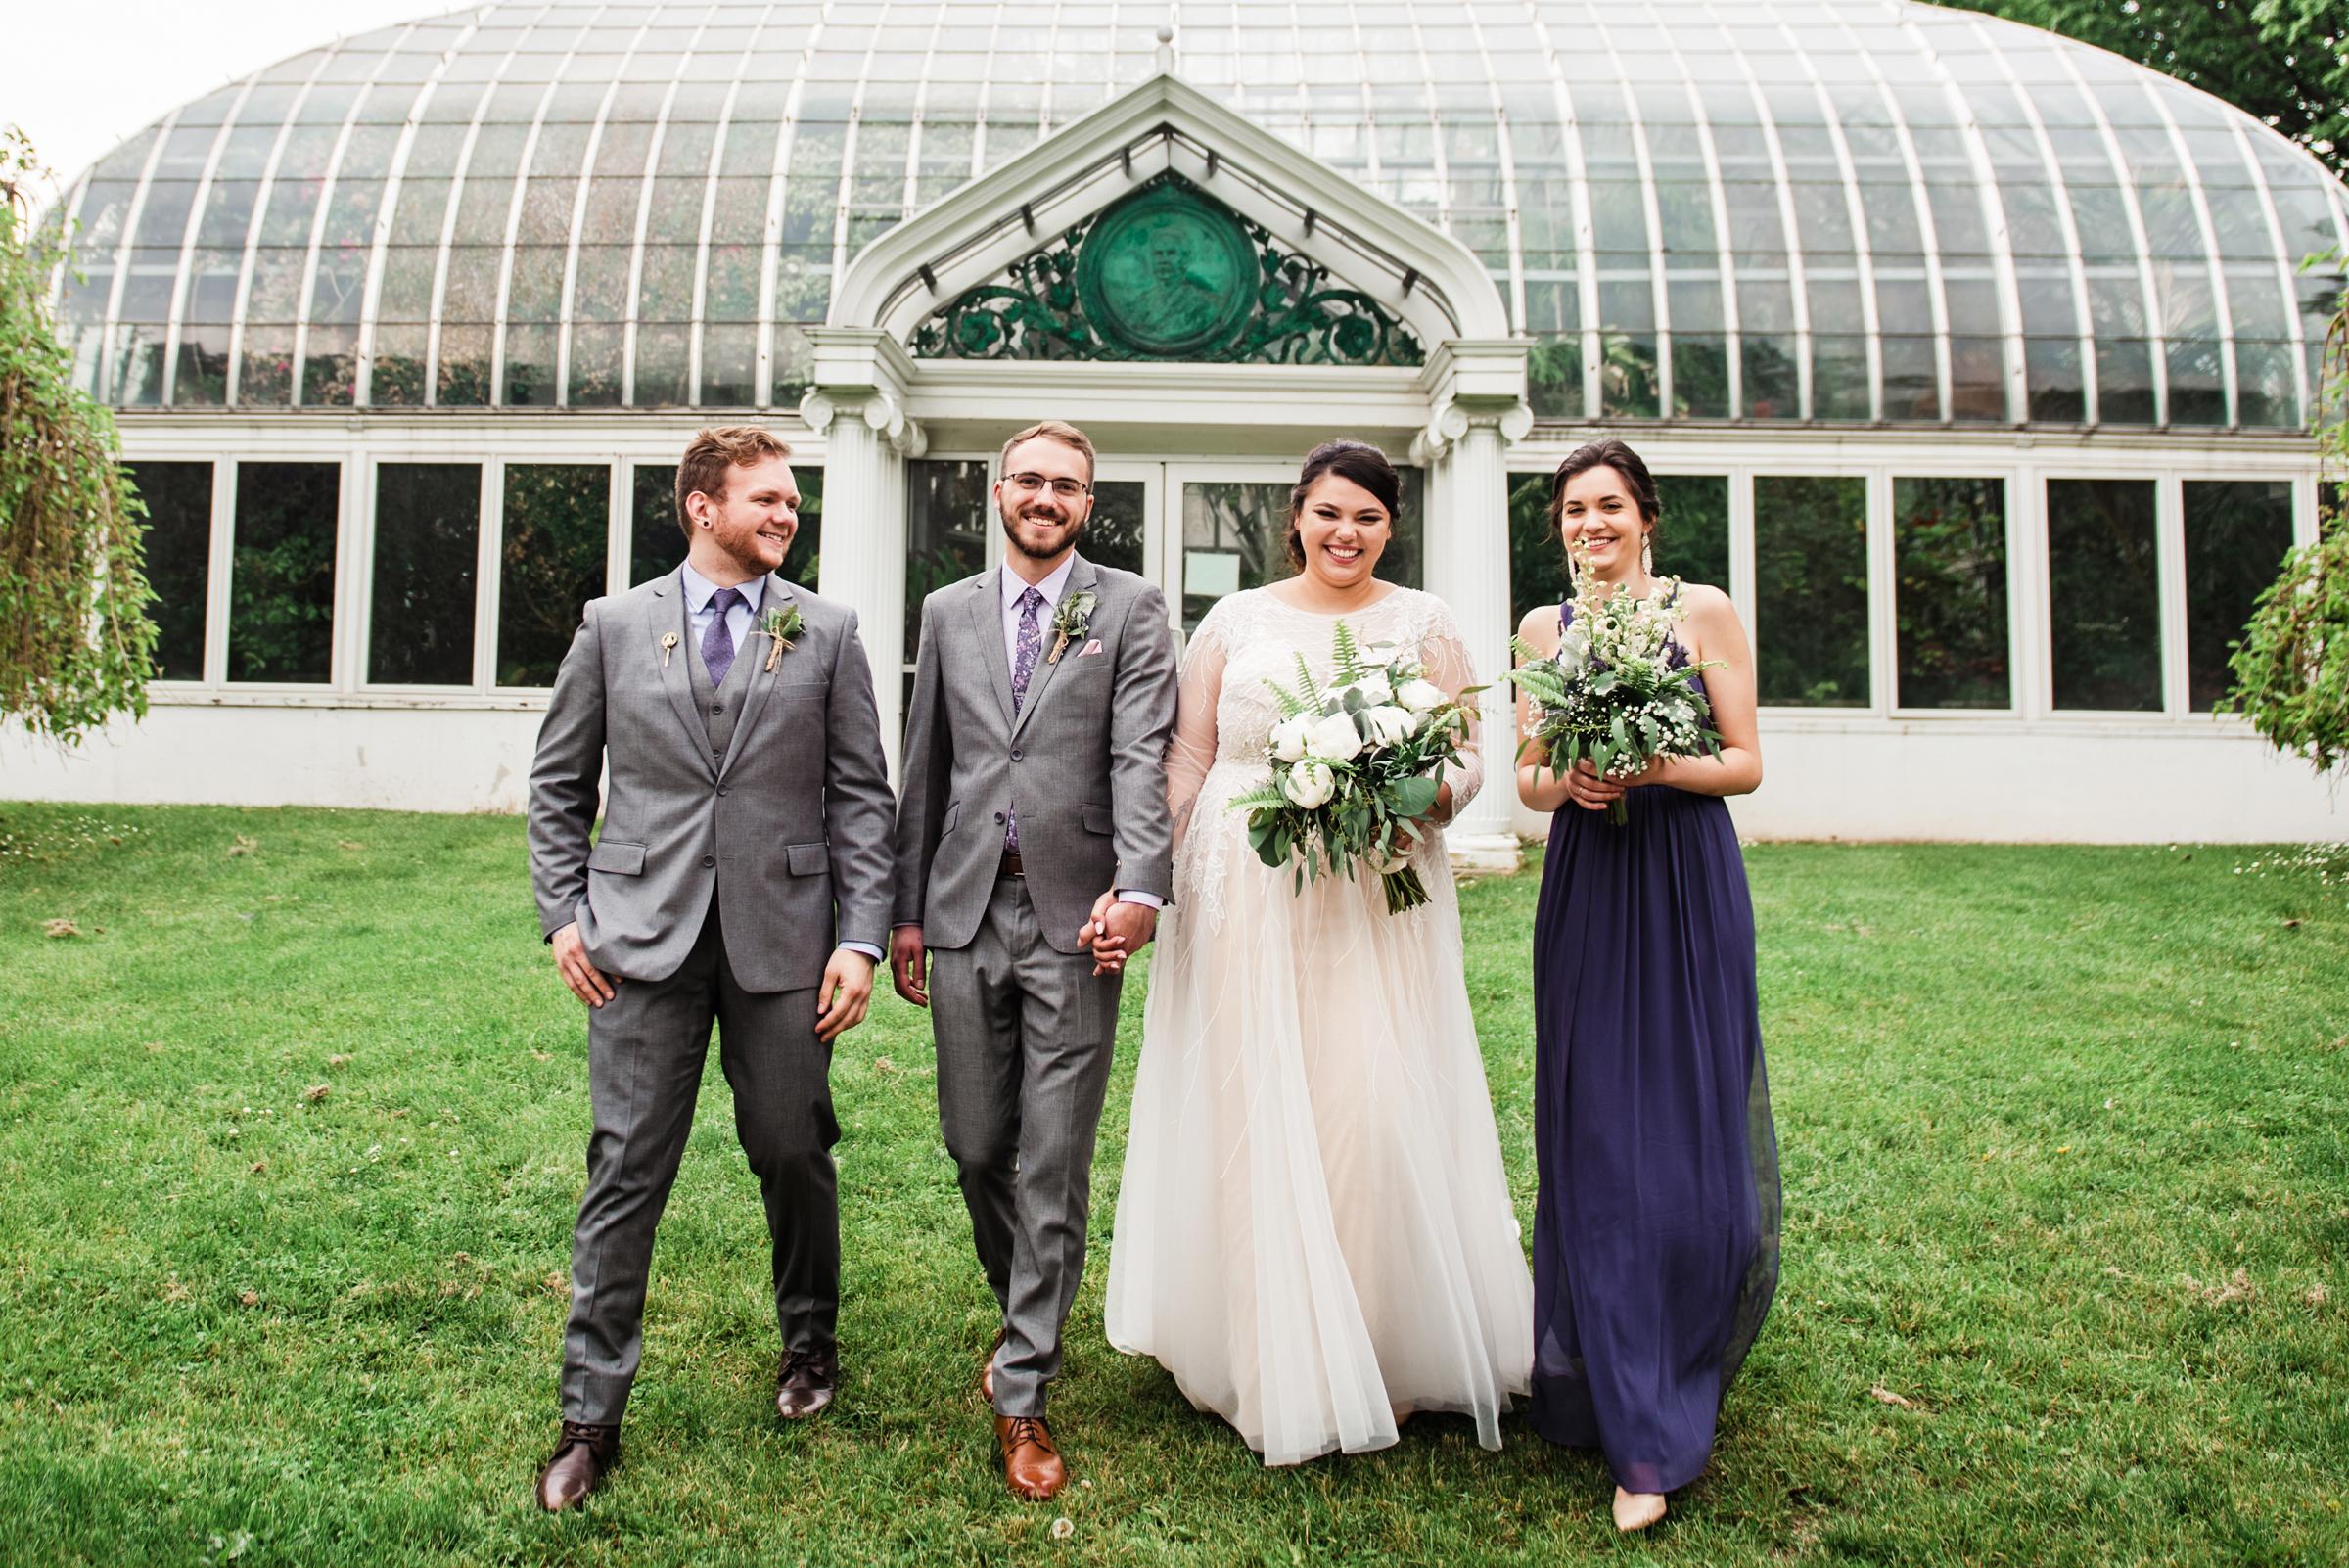 Studio_180_Lamberton_Conservatory_Rochester_Wedding_JILL_STUDIO_Rochester_NY_Photographer_DSC_8754.jpg